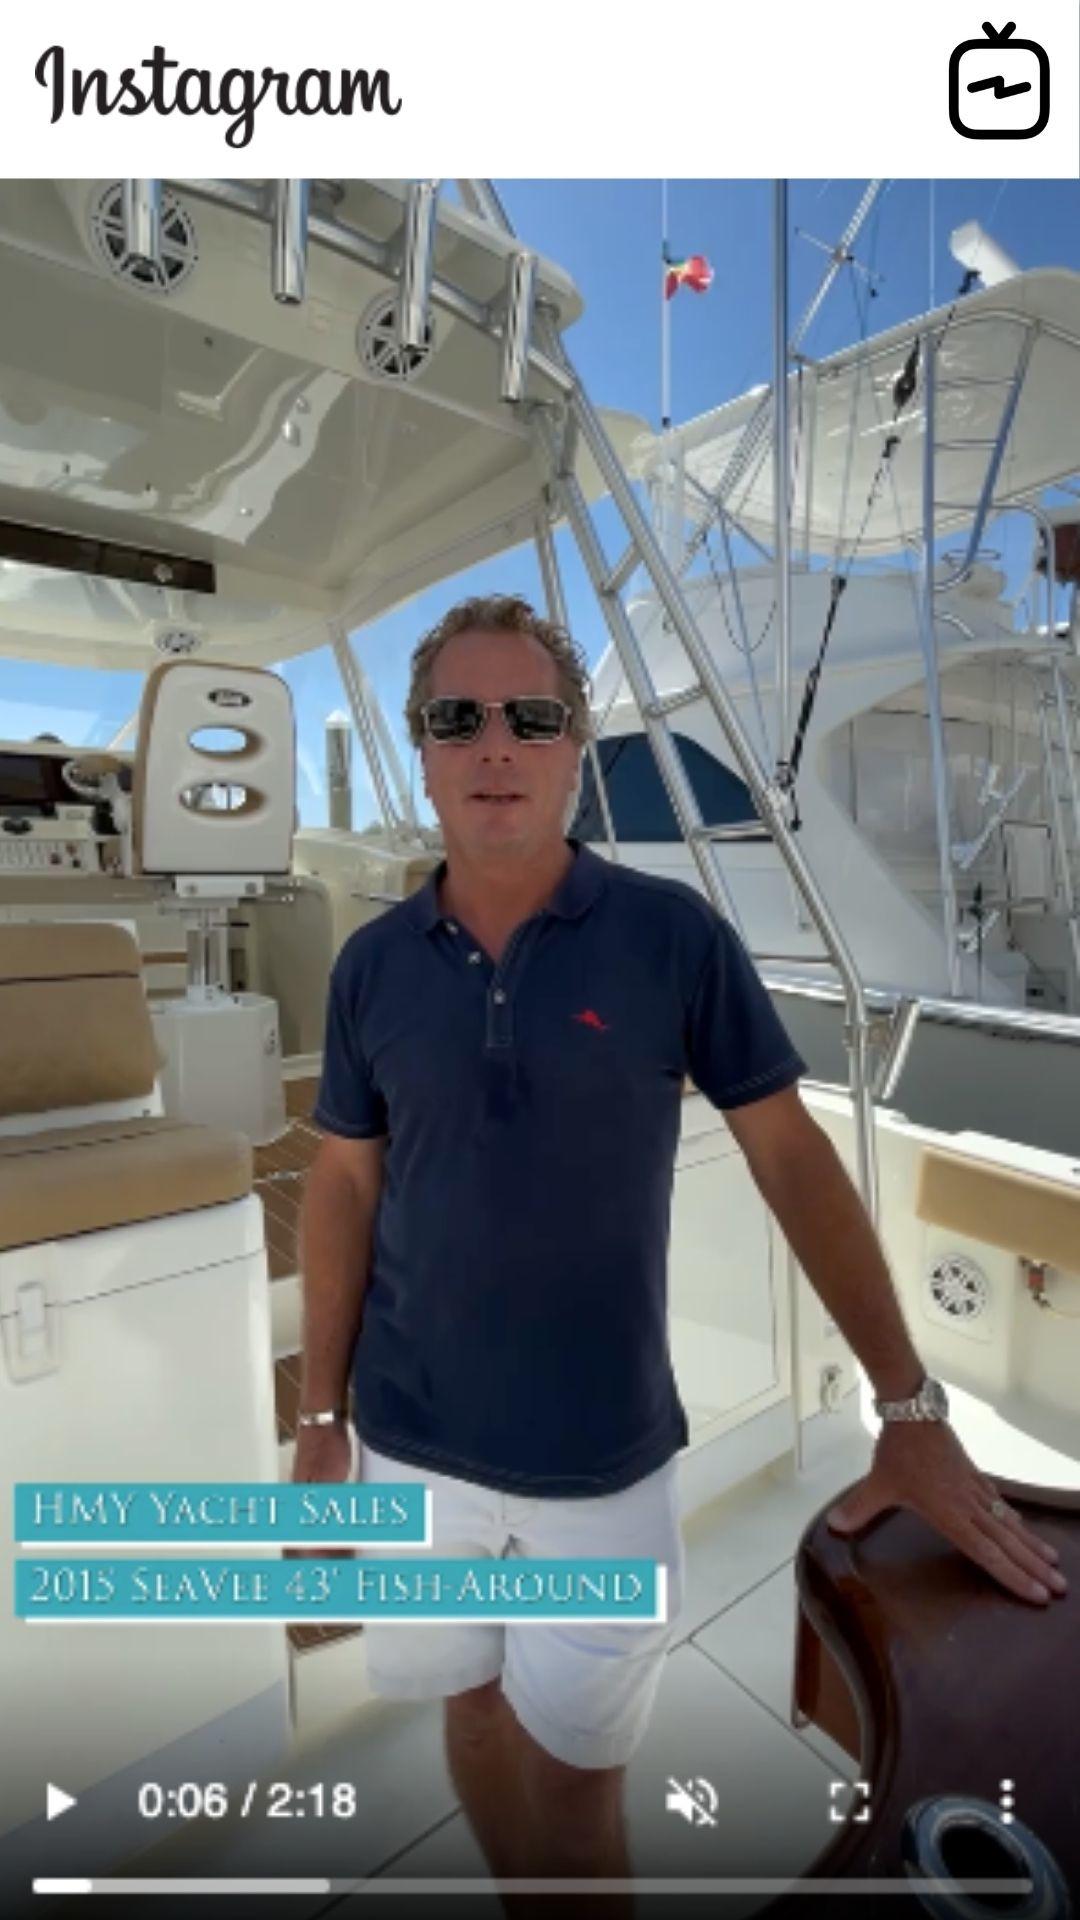 WATCH IGTV VIDEO - 2015 SeaVee 430 Fish-Around - Exit Strategy